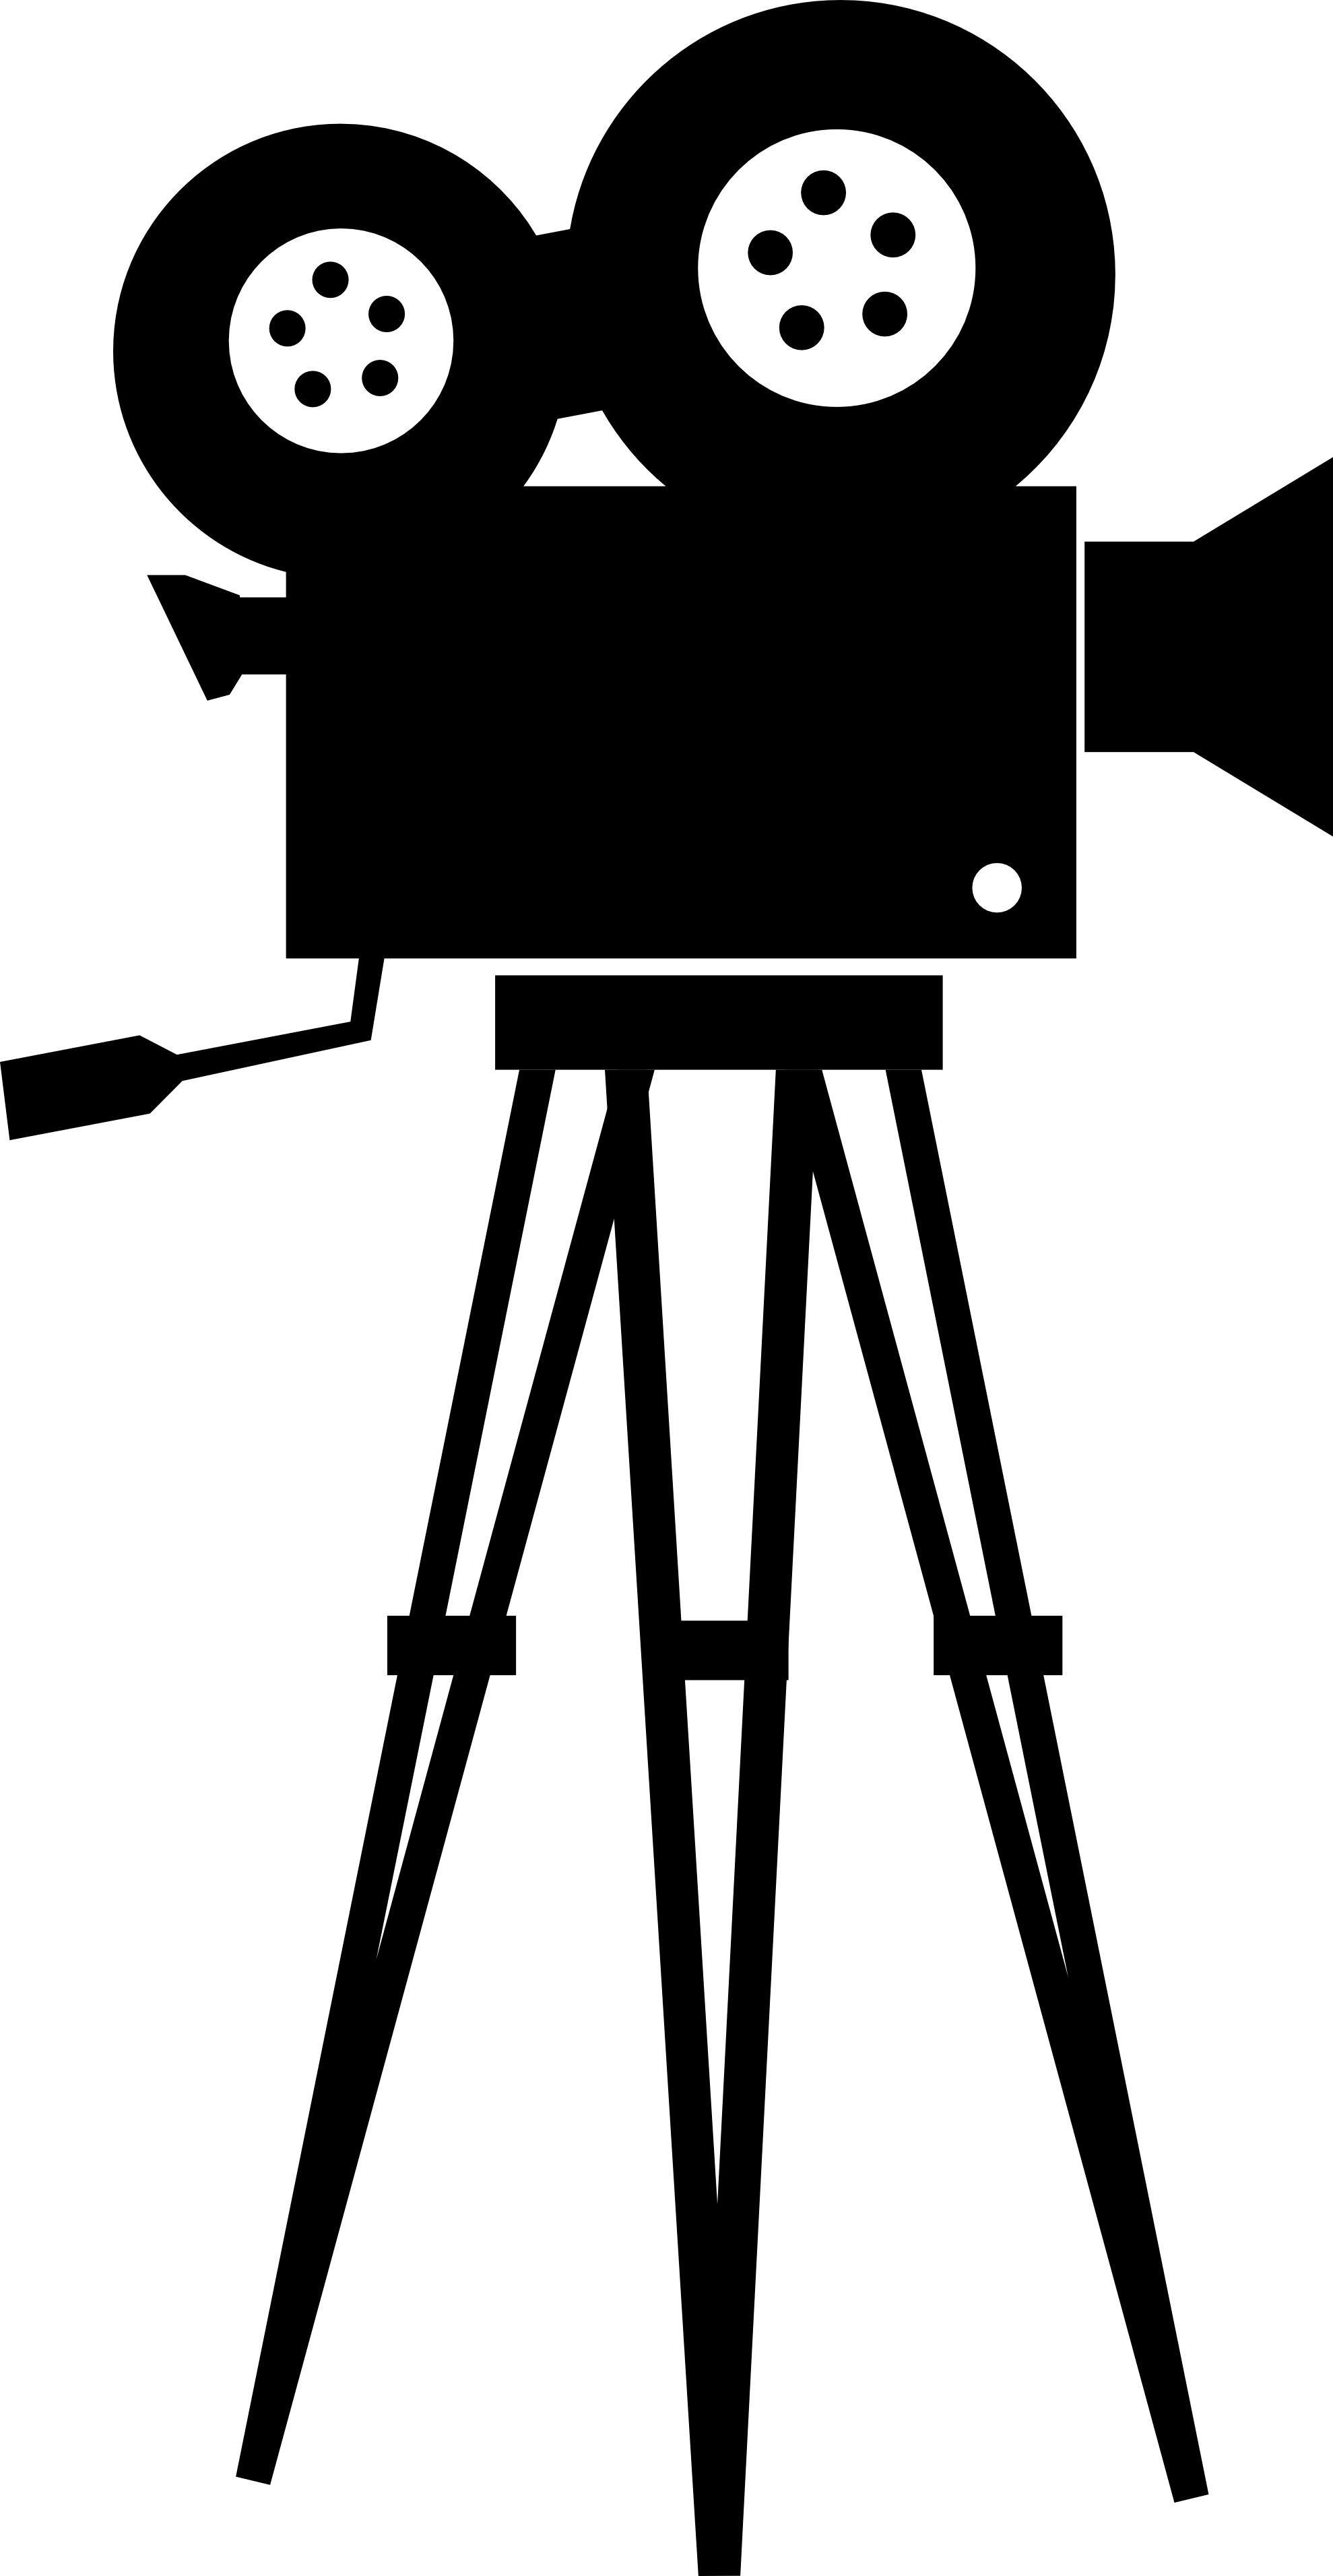 17 camera logo vector png images